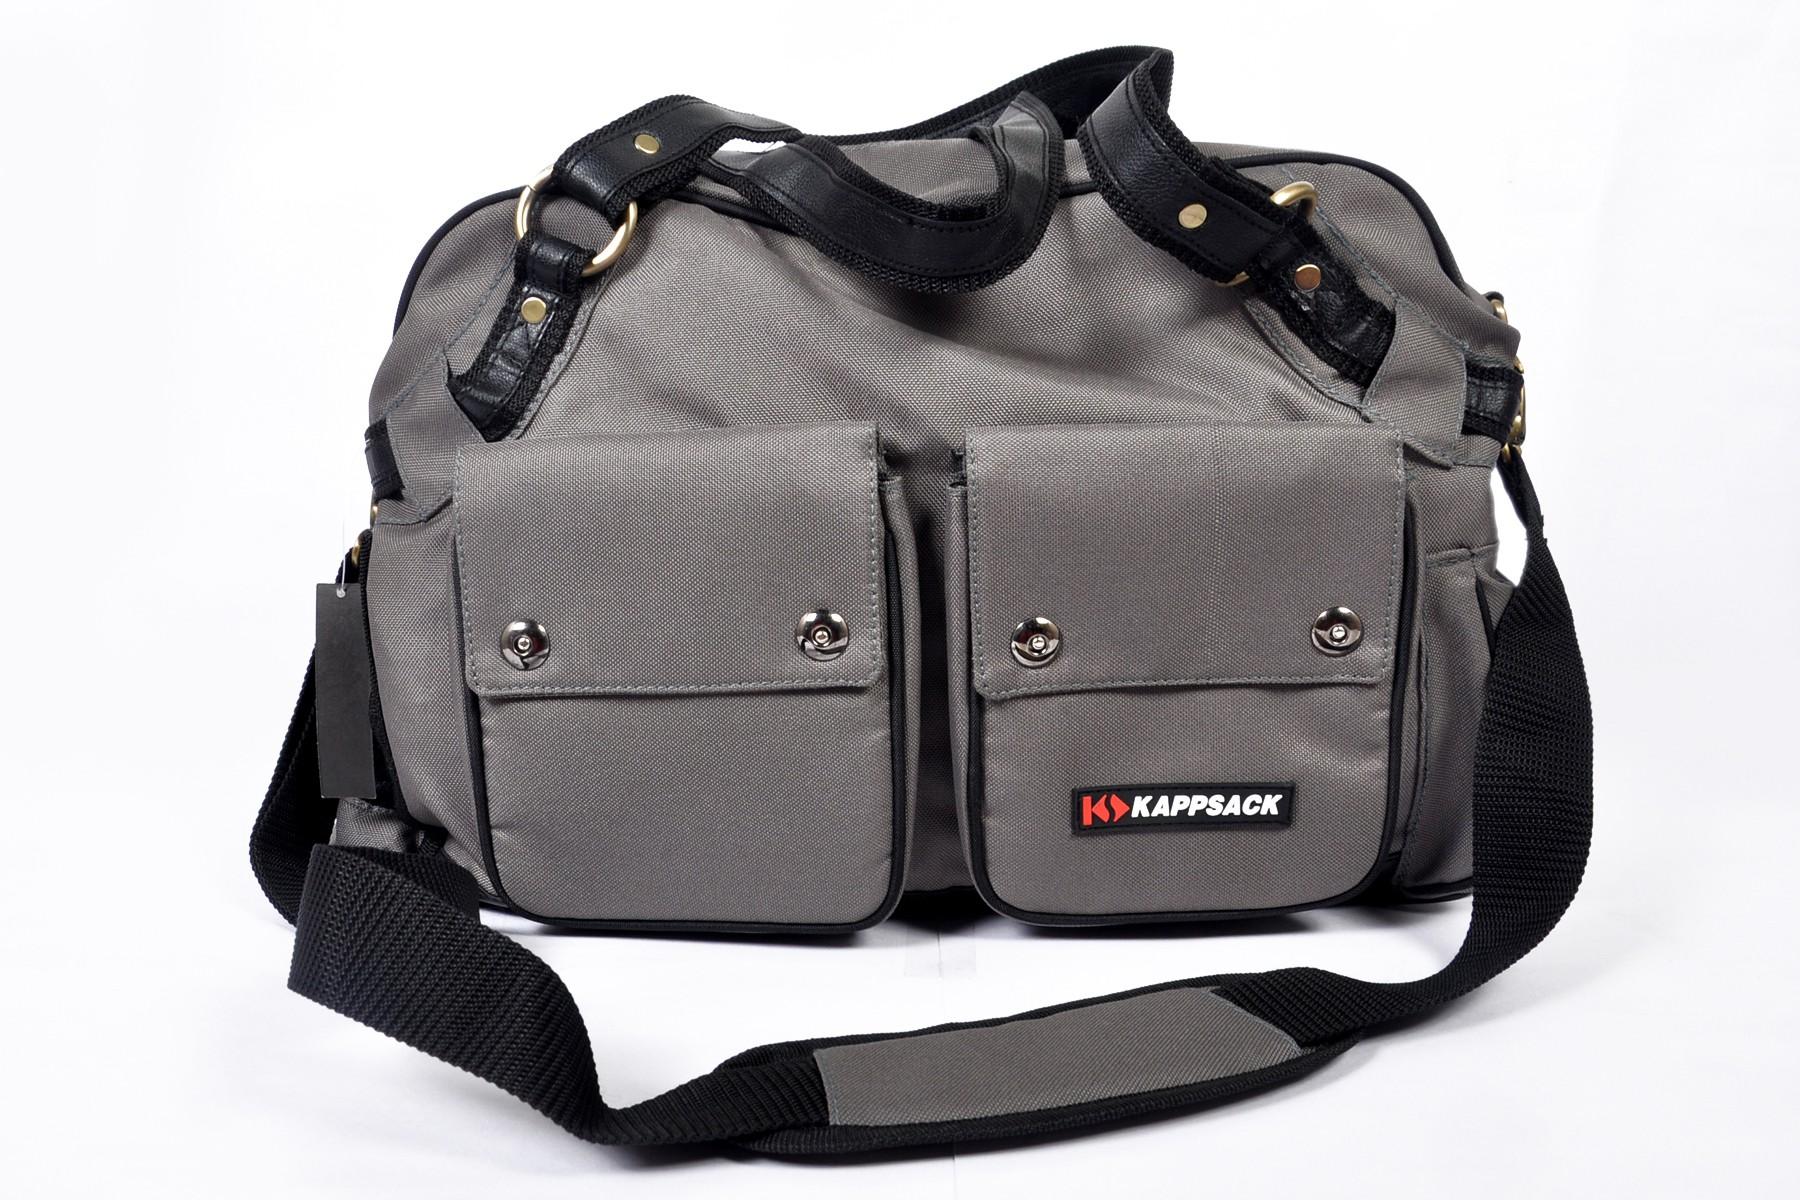 kappsack Mama Bag with Changing Mat Diaper Bag(Gray) Flipkart